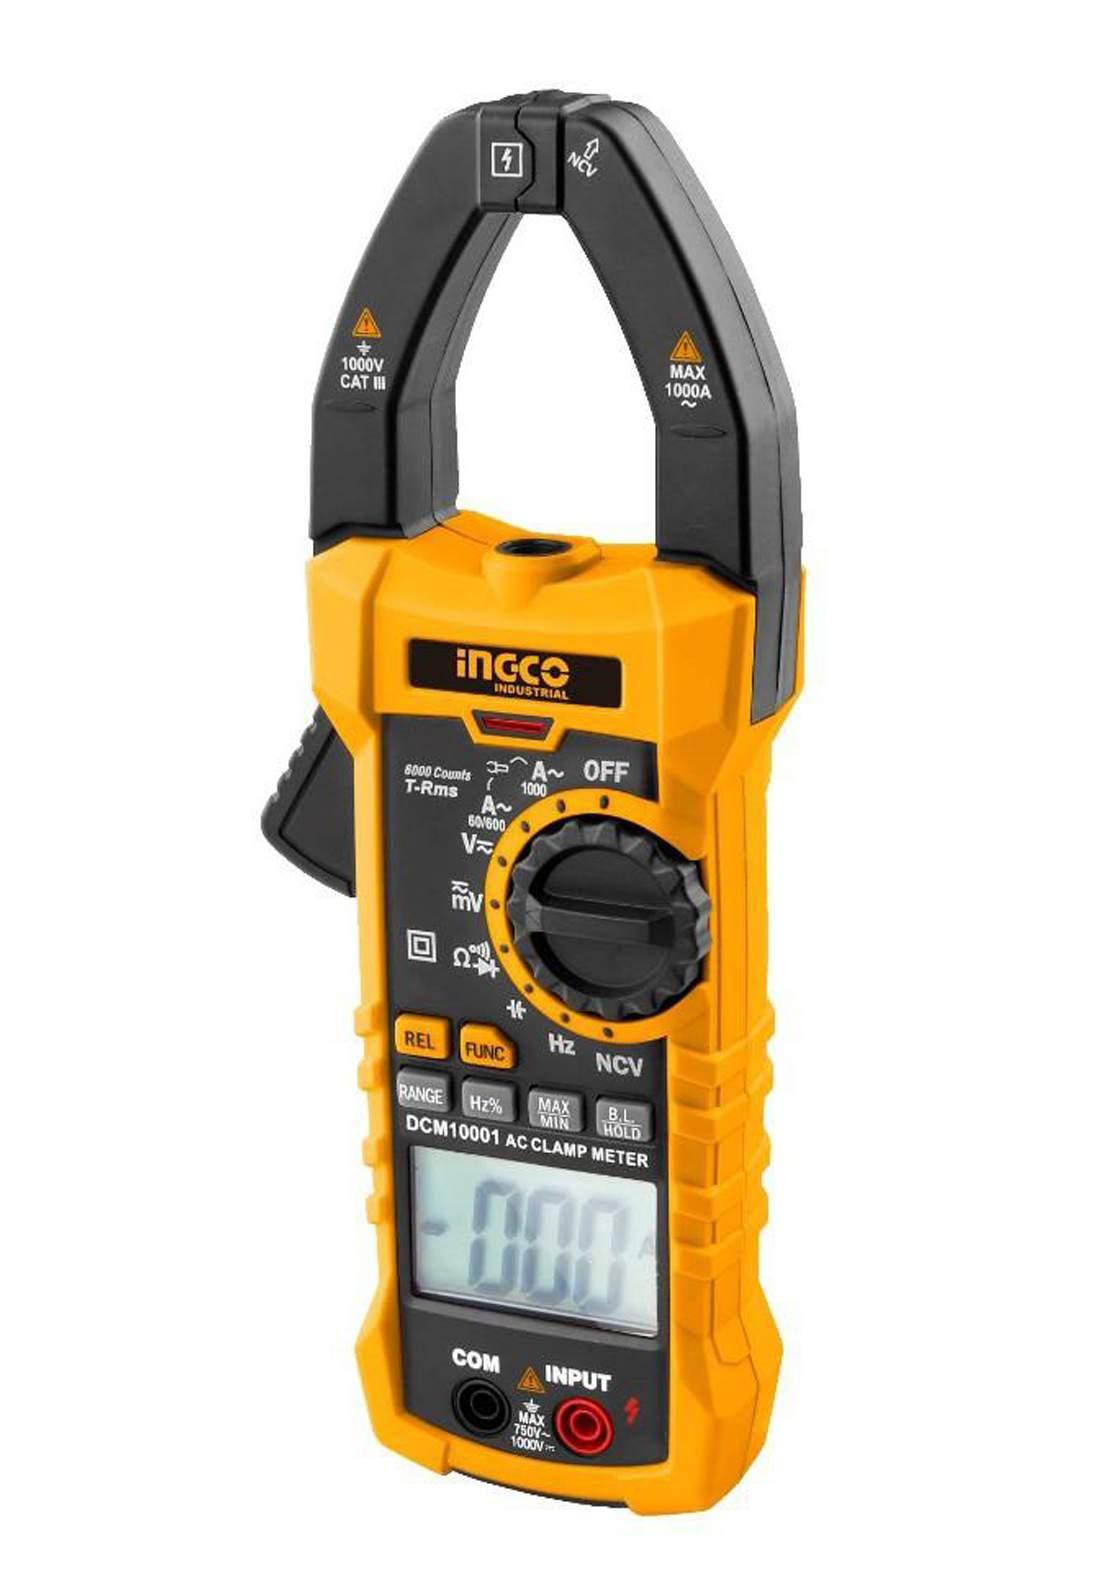 Ingco - dcm10001   Digital clamp meter 1000 ampere AC     ديجيتال كلامب ميتر 1000 امبير AC